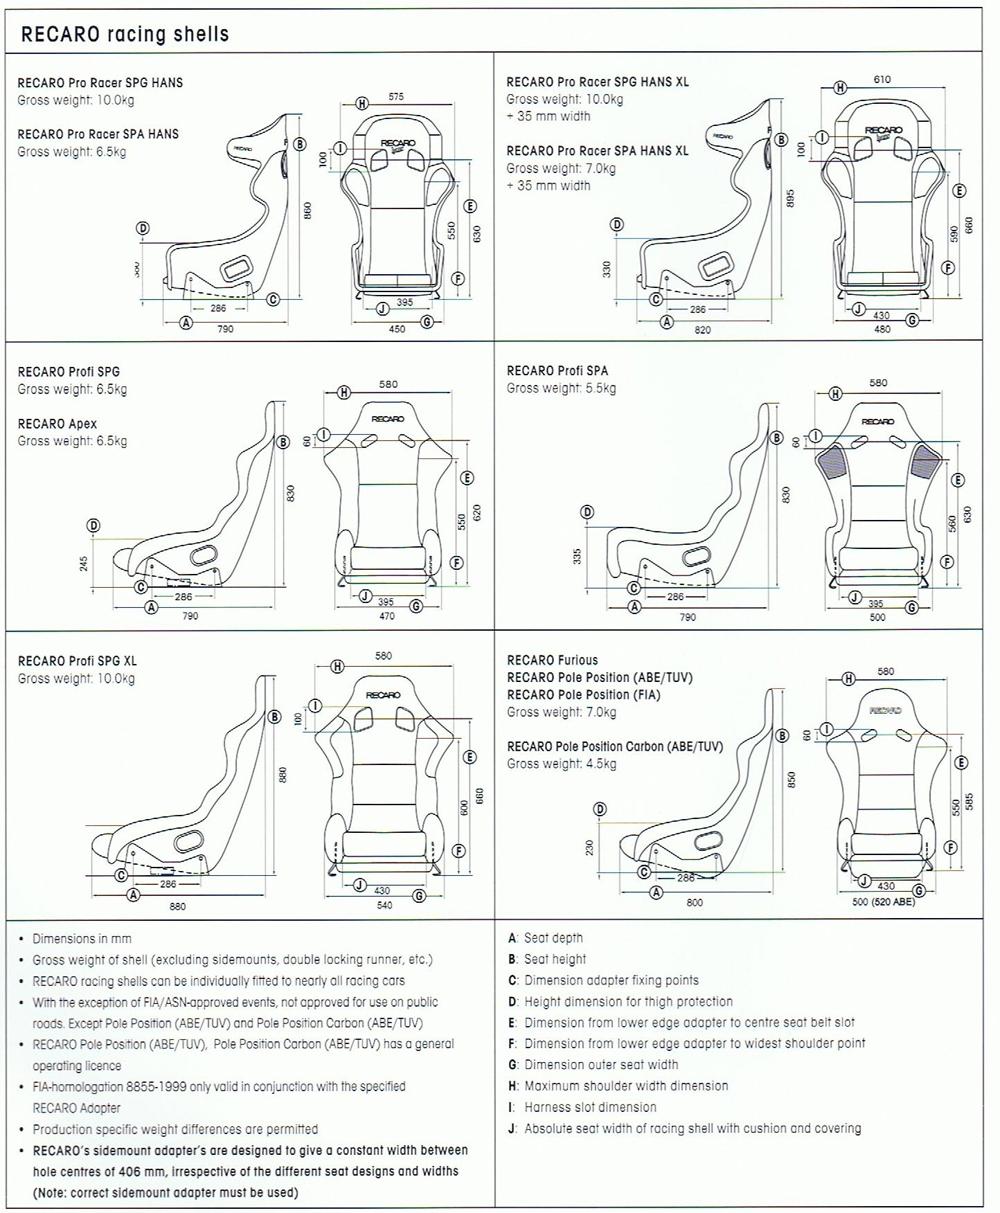 how to set back hatch c chart